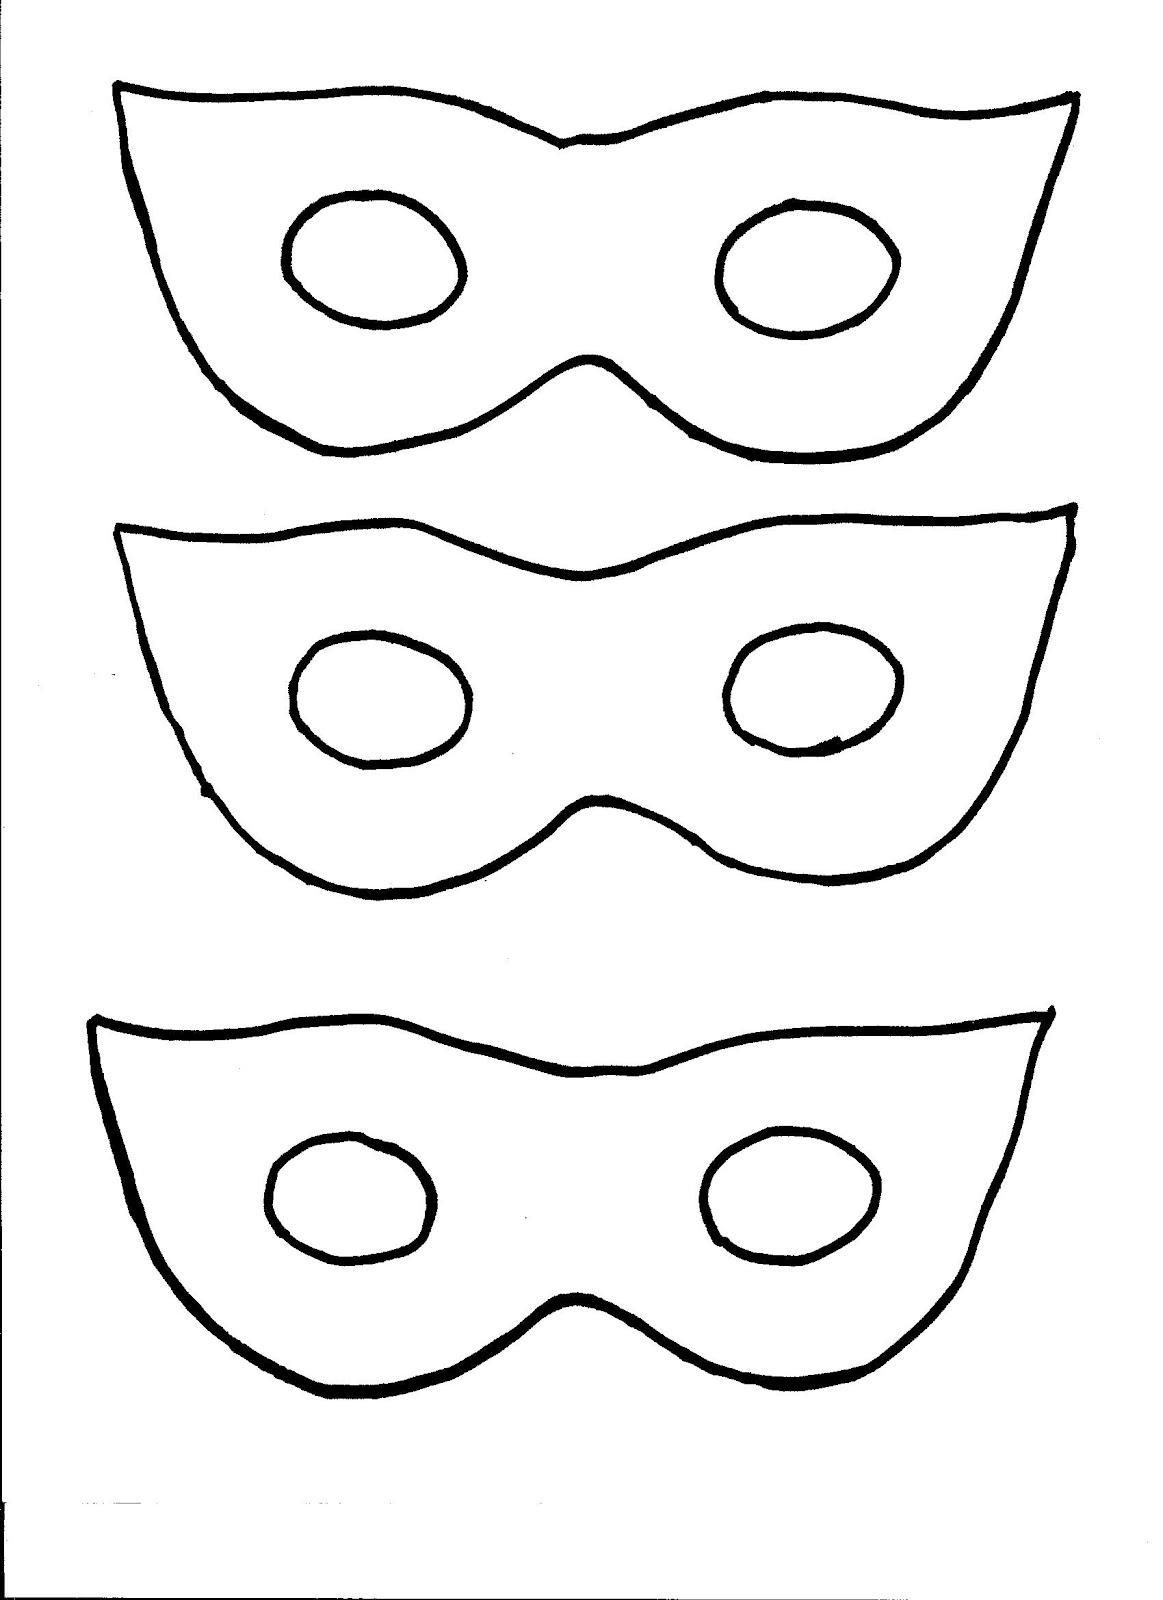 Super Hero Mask Template | Clipart Panda - Free Clipart Images - Free Printable Superhero Masks